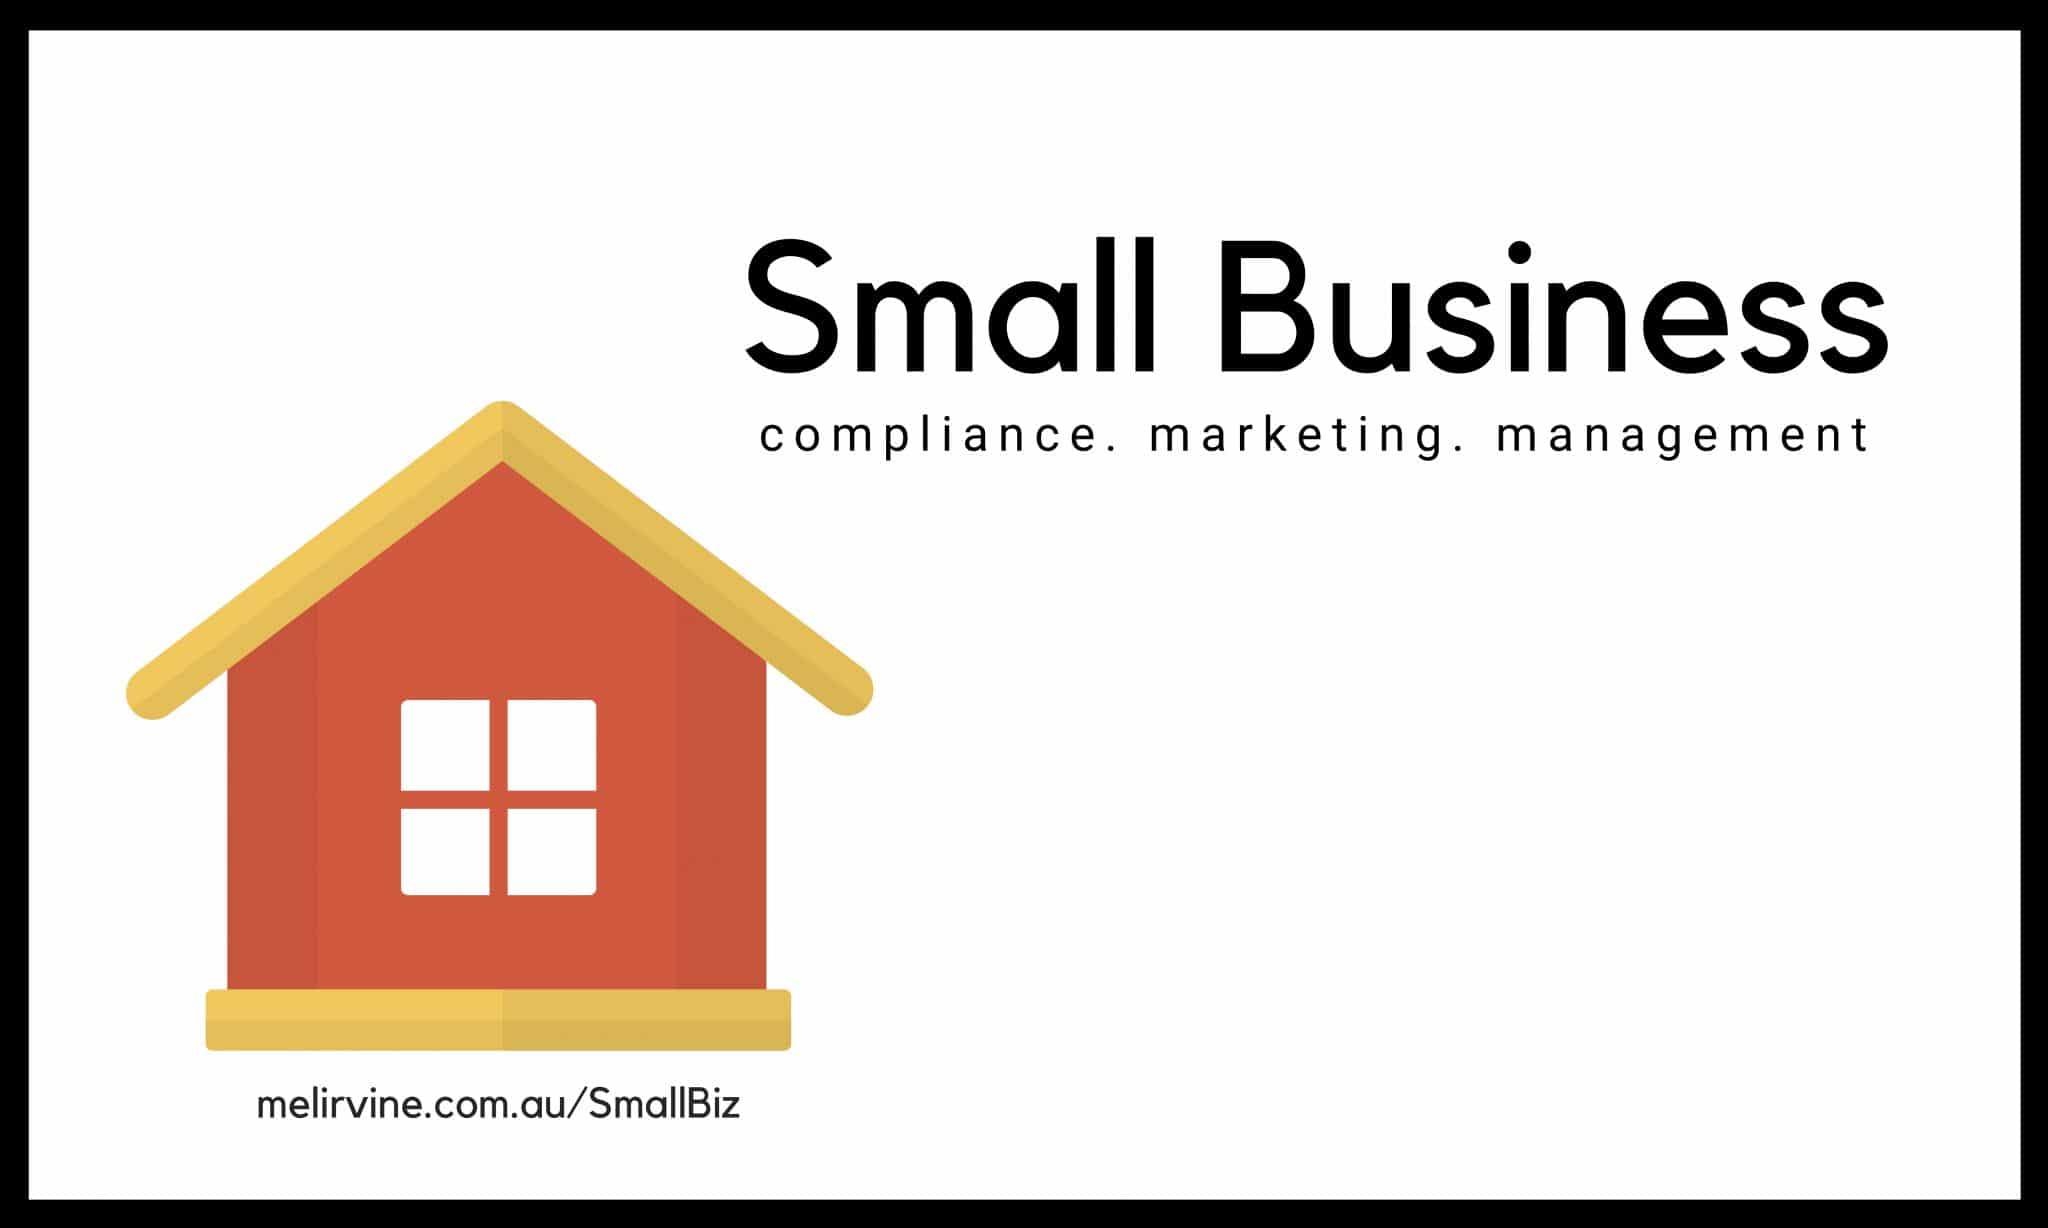 SMALLBIZ talking small business compliance, marketing and management @ Melinda J. Irvine